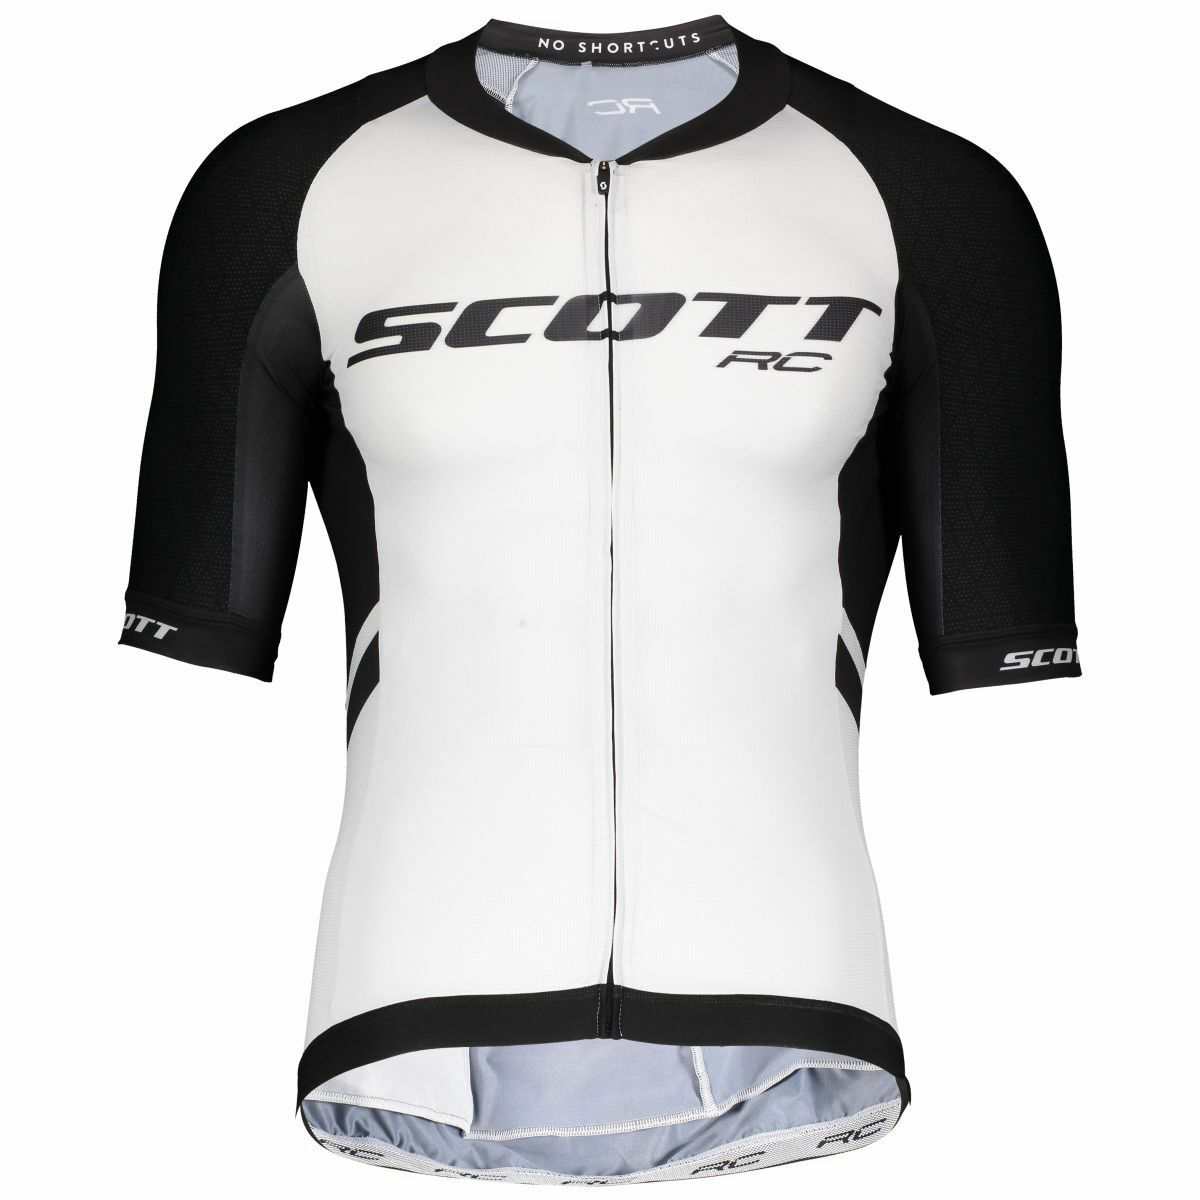 Scott RC Premium ITD Fahrrad Trikot kurz weiß/schwarz 2019